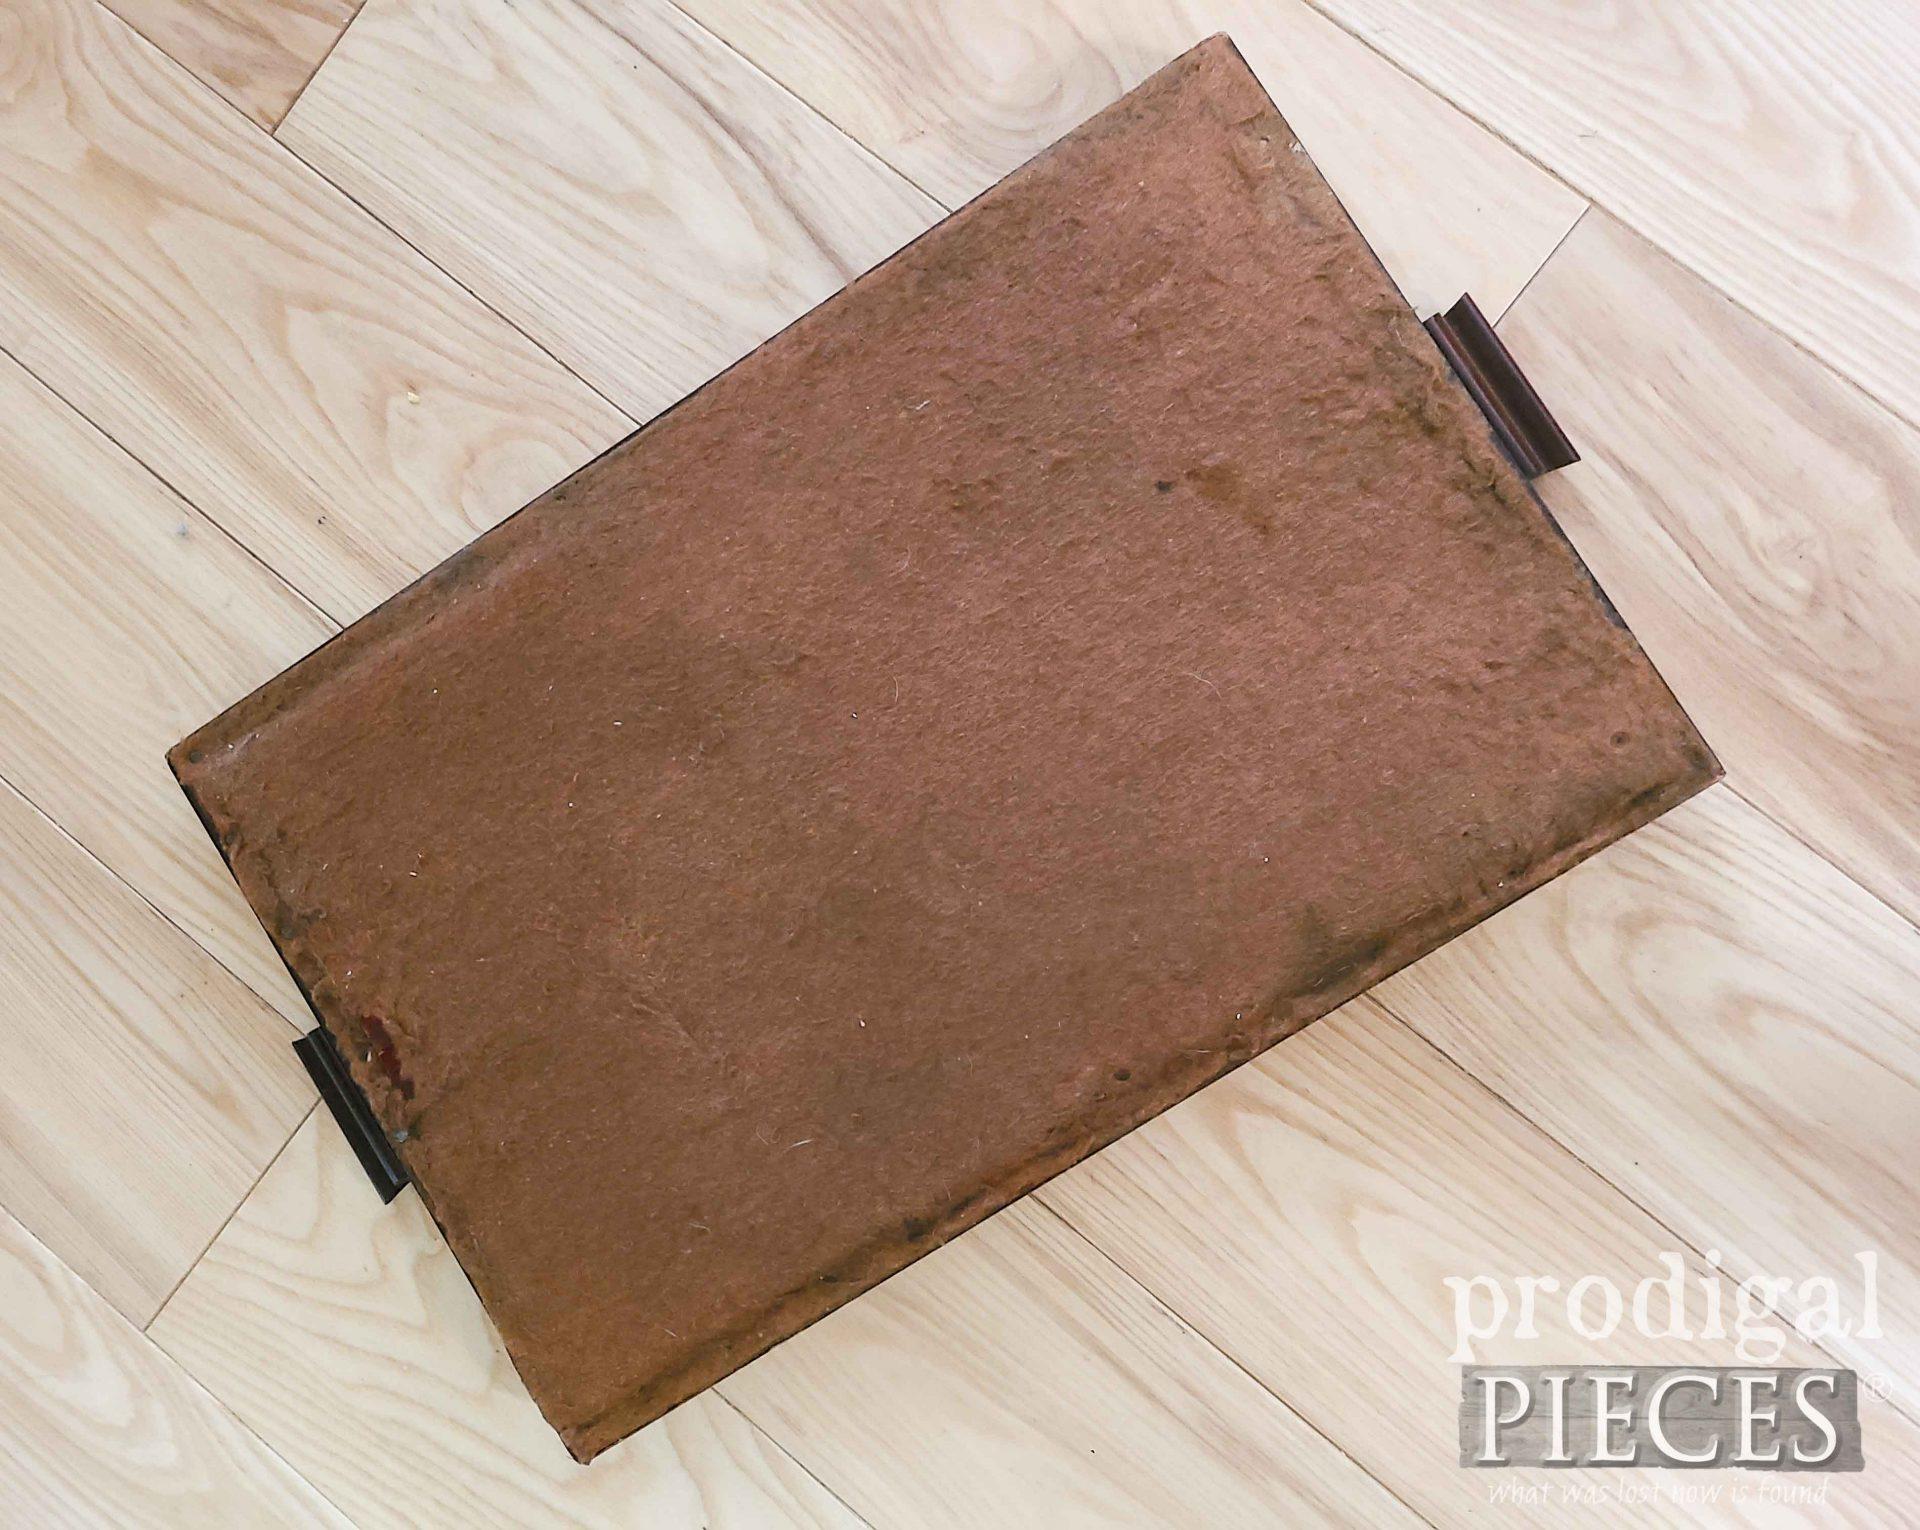 Felted Back Tray Bottom by Larissa of Prodigal Pieces | prodigalpieces.com #prodigalpiees